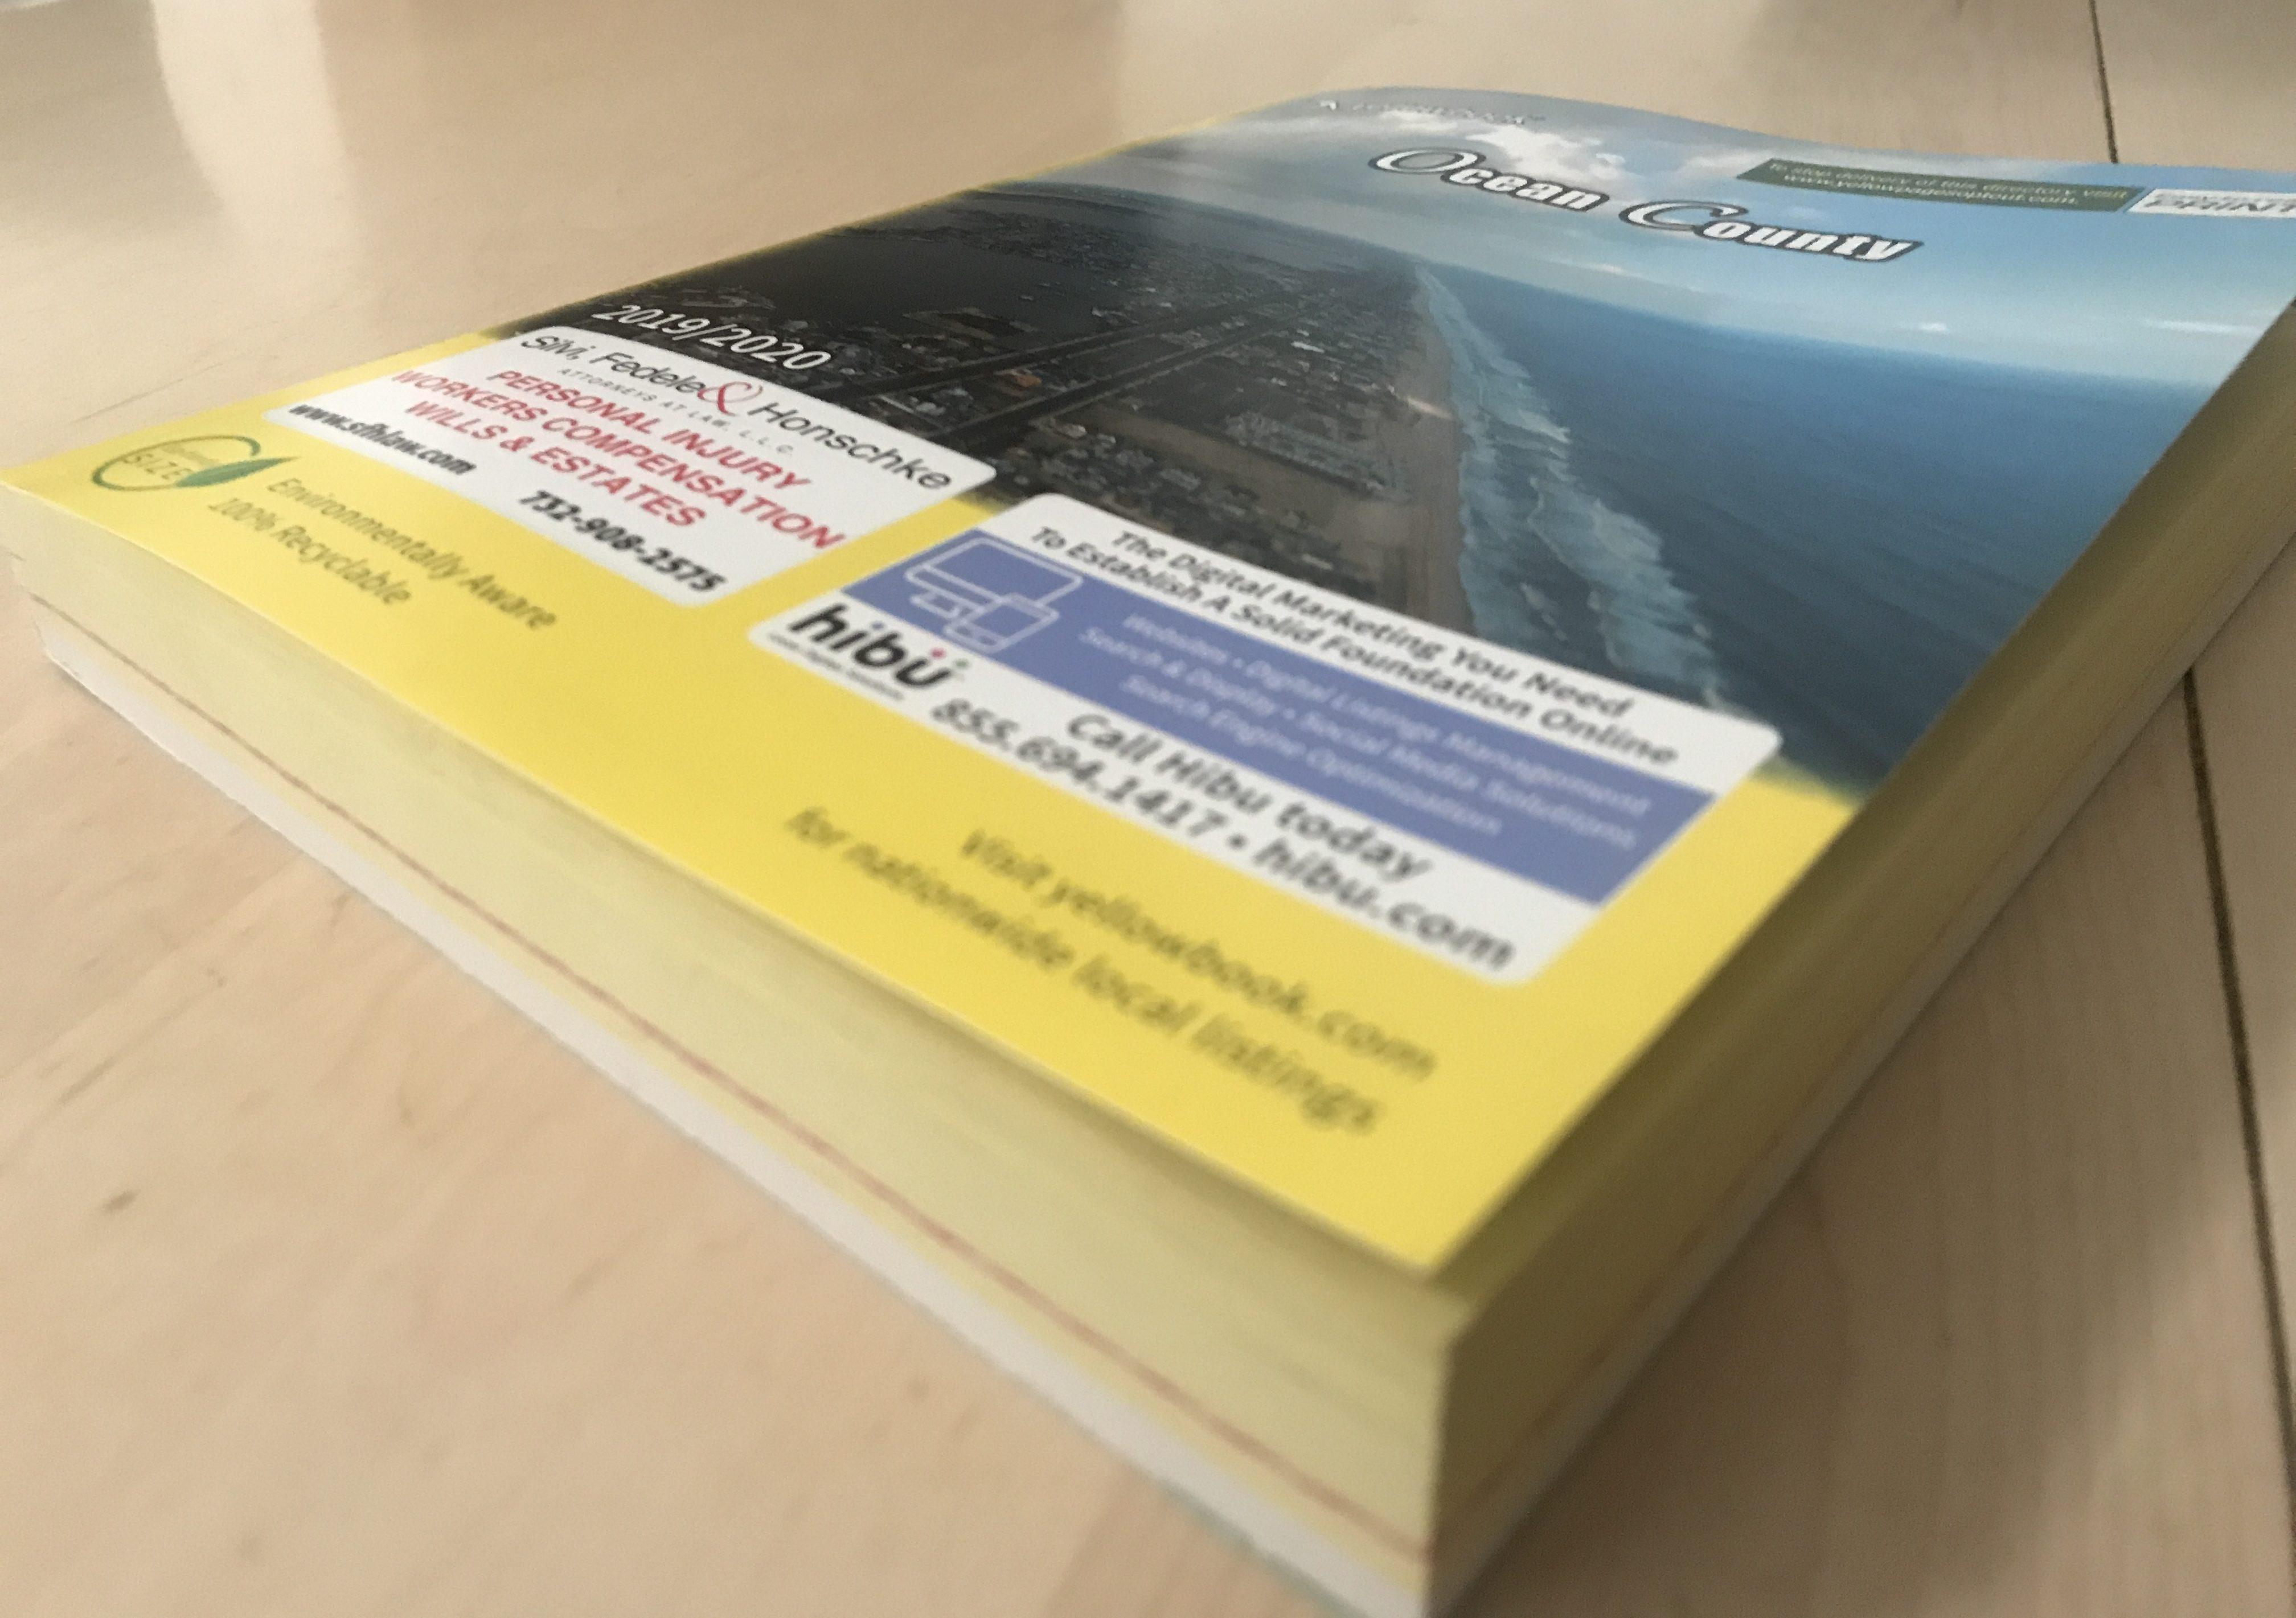 A 2019 Ocean County phone book. (Photo: Daniel Nee)